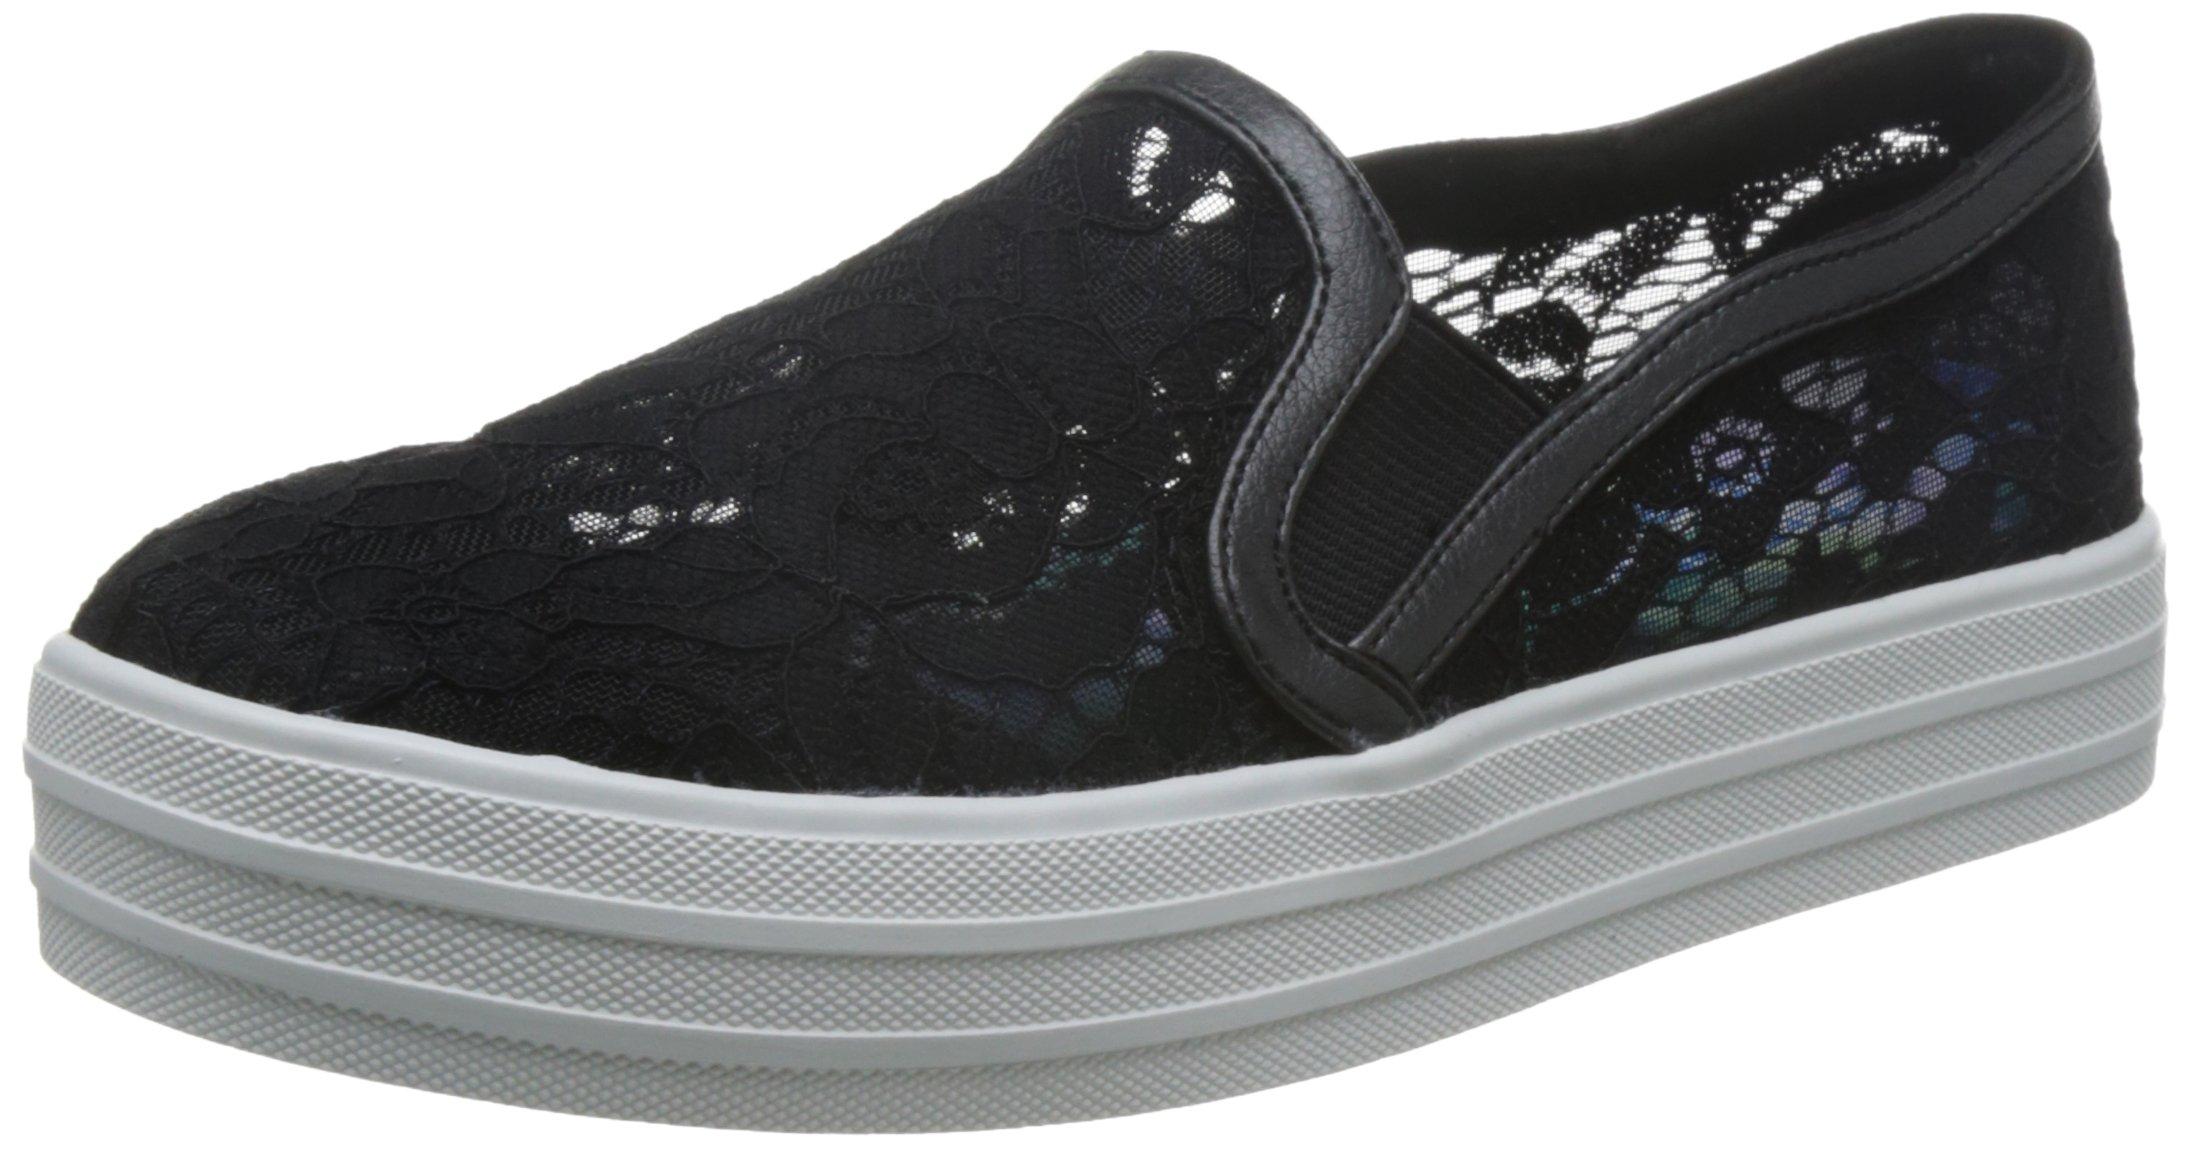 Skechers Women's Double Up Flora Flatform Slip-On Sneaker,Black,US 5 M